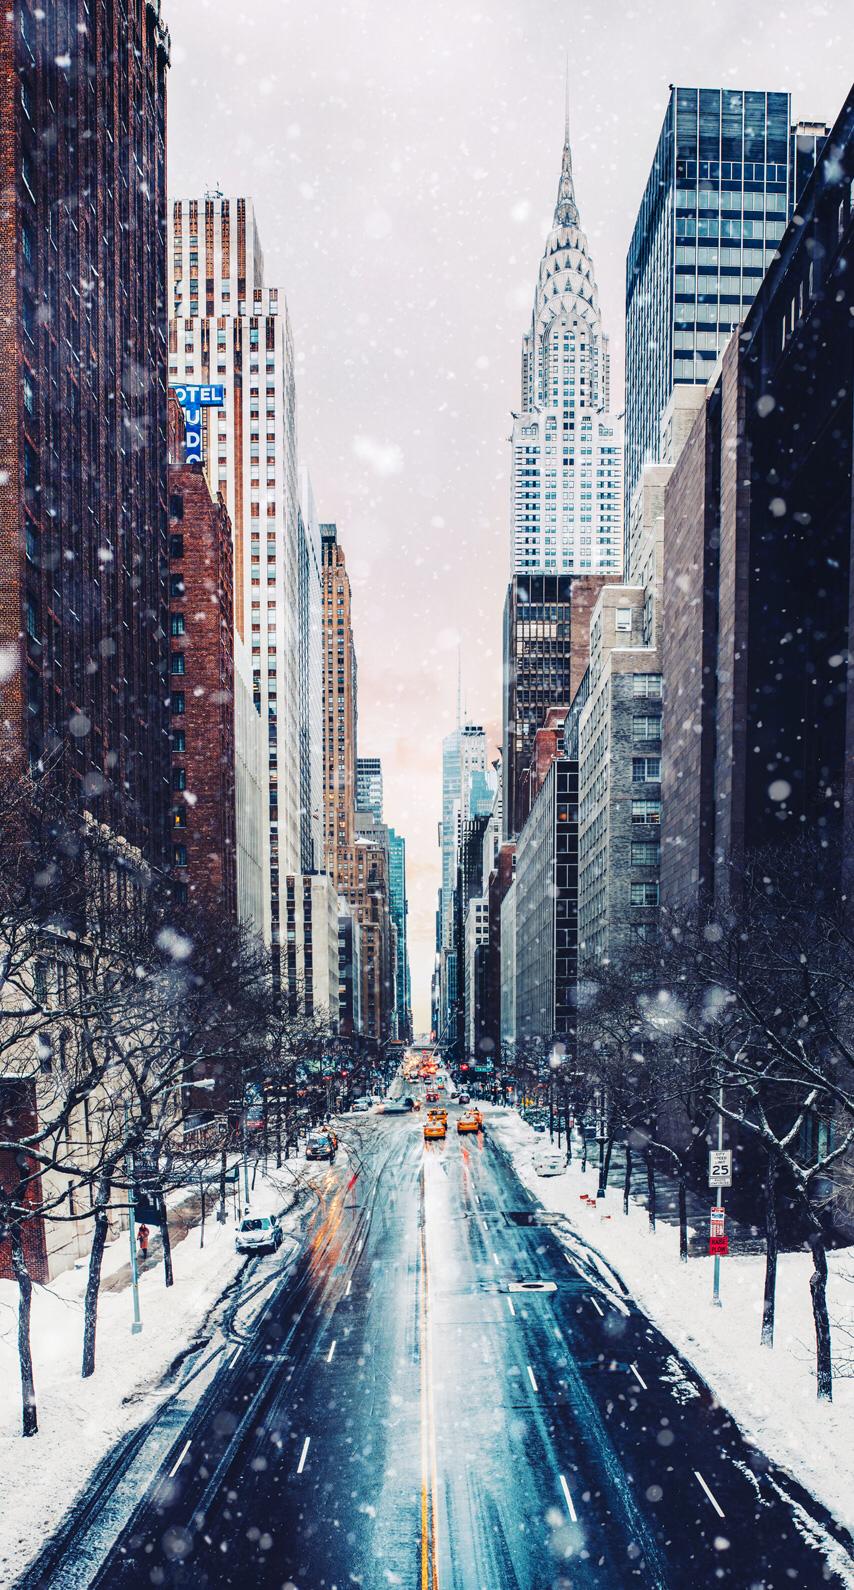 iphonewallpaper wallpaper phonewallpaper instagram city snow 854x1590